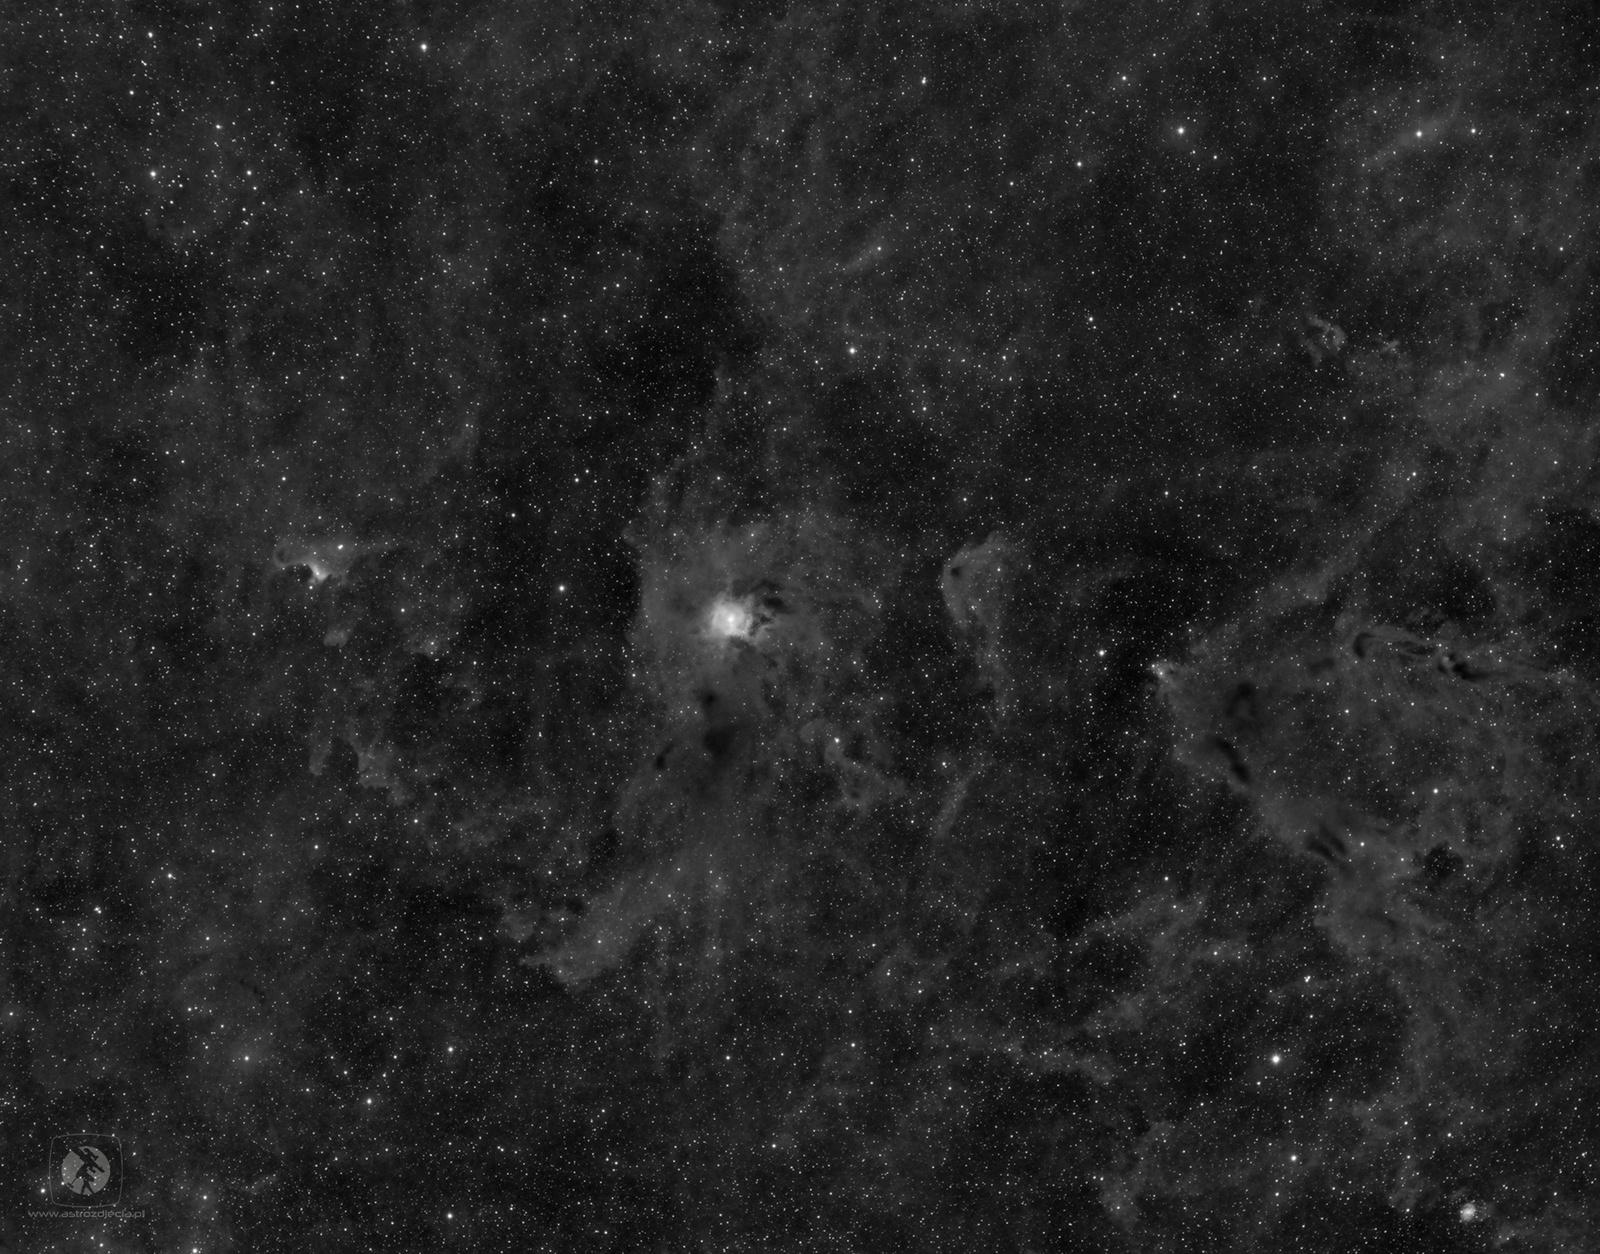 NGC7023-forum.thumb.jpg.d542b2d3a15eefcc3e9dd768cb9e749b.jpg